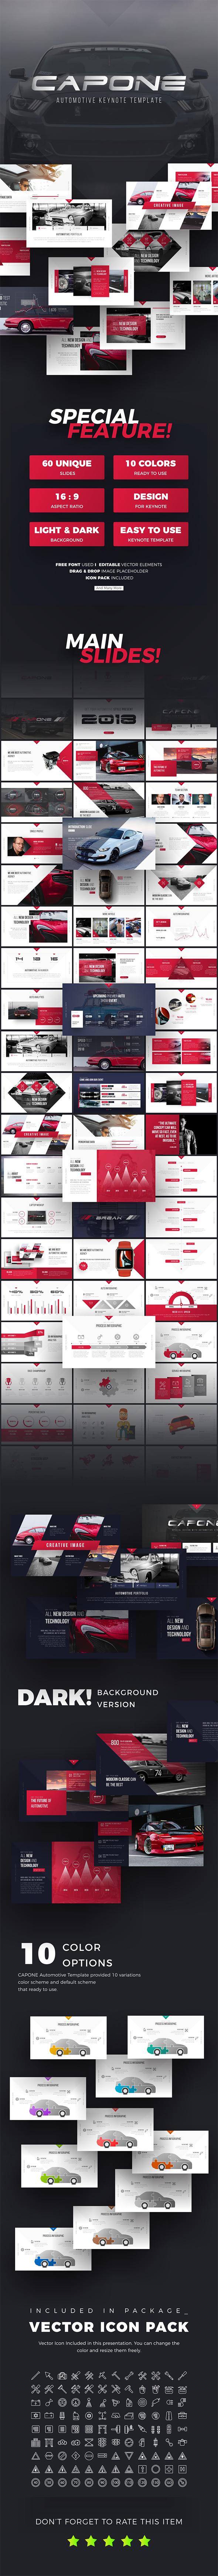 Capone Automotive Presentation Template - Keynote Templates Presentation Templates